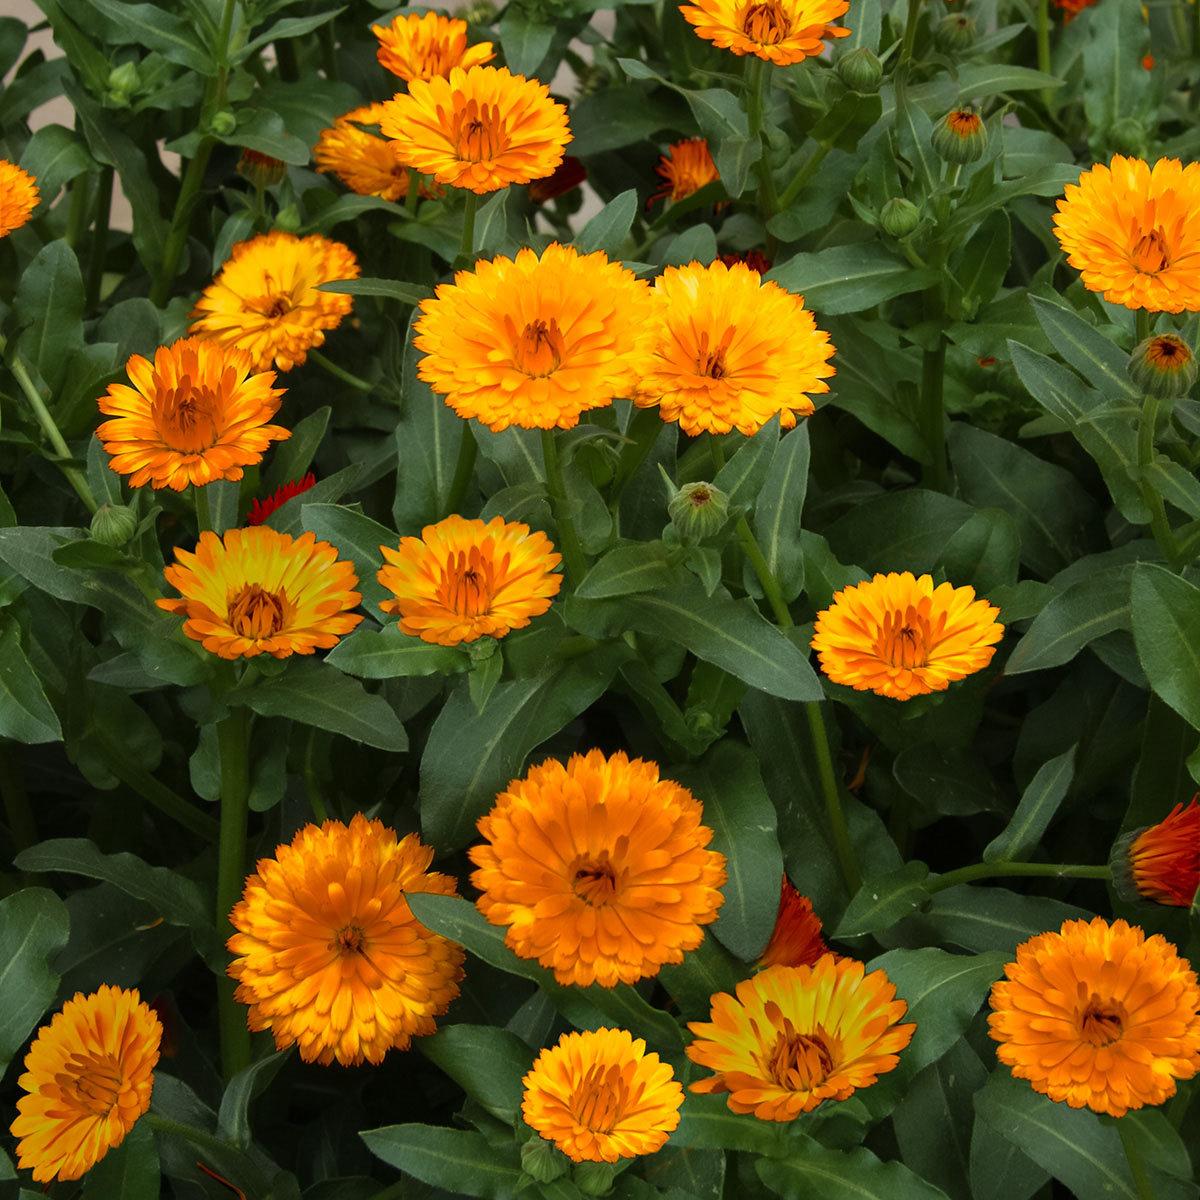 winterharte calendula winter wonders amber arctic von